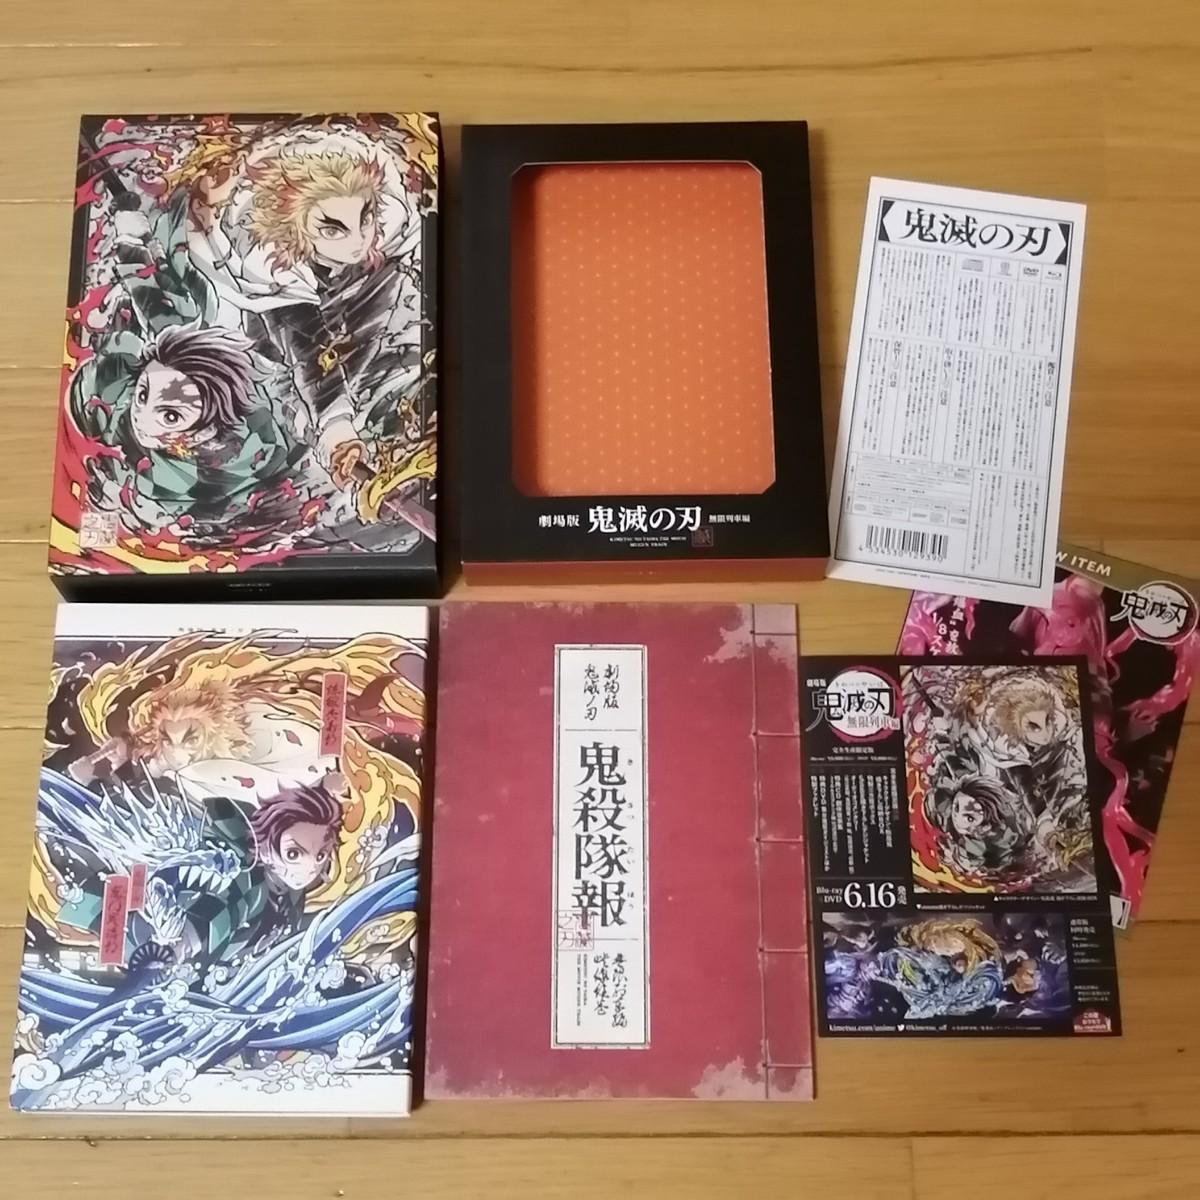 ■劇場版 鬼滅の刃 無限列車編 完全生産限定版 Blu-ray ブルーレイ■煉獄杏寿郎 CD 映画